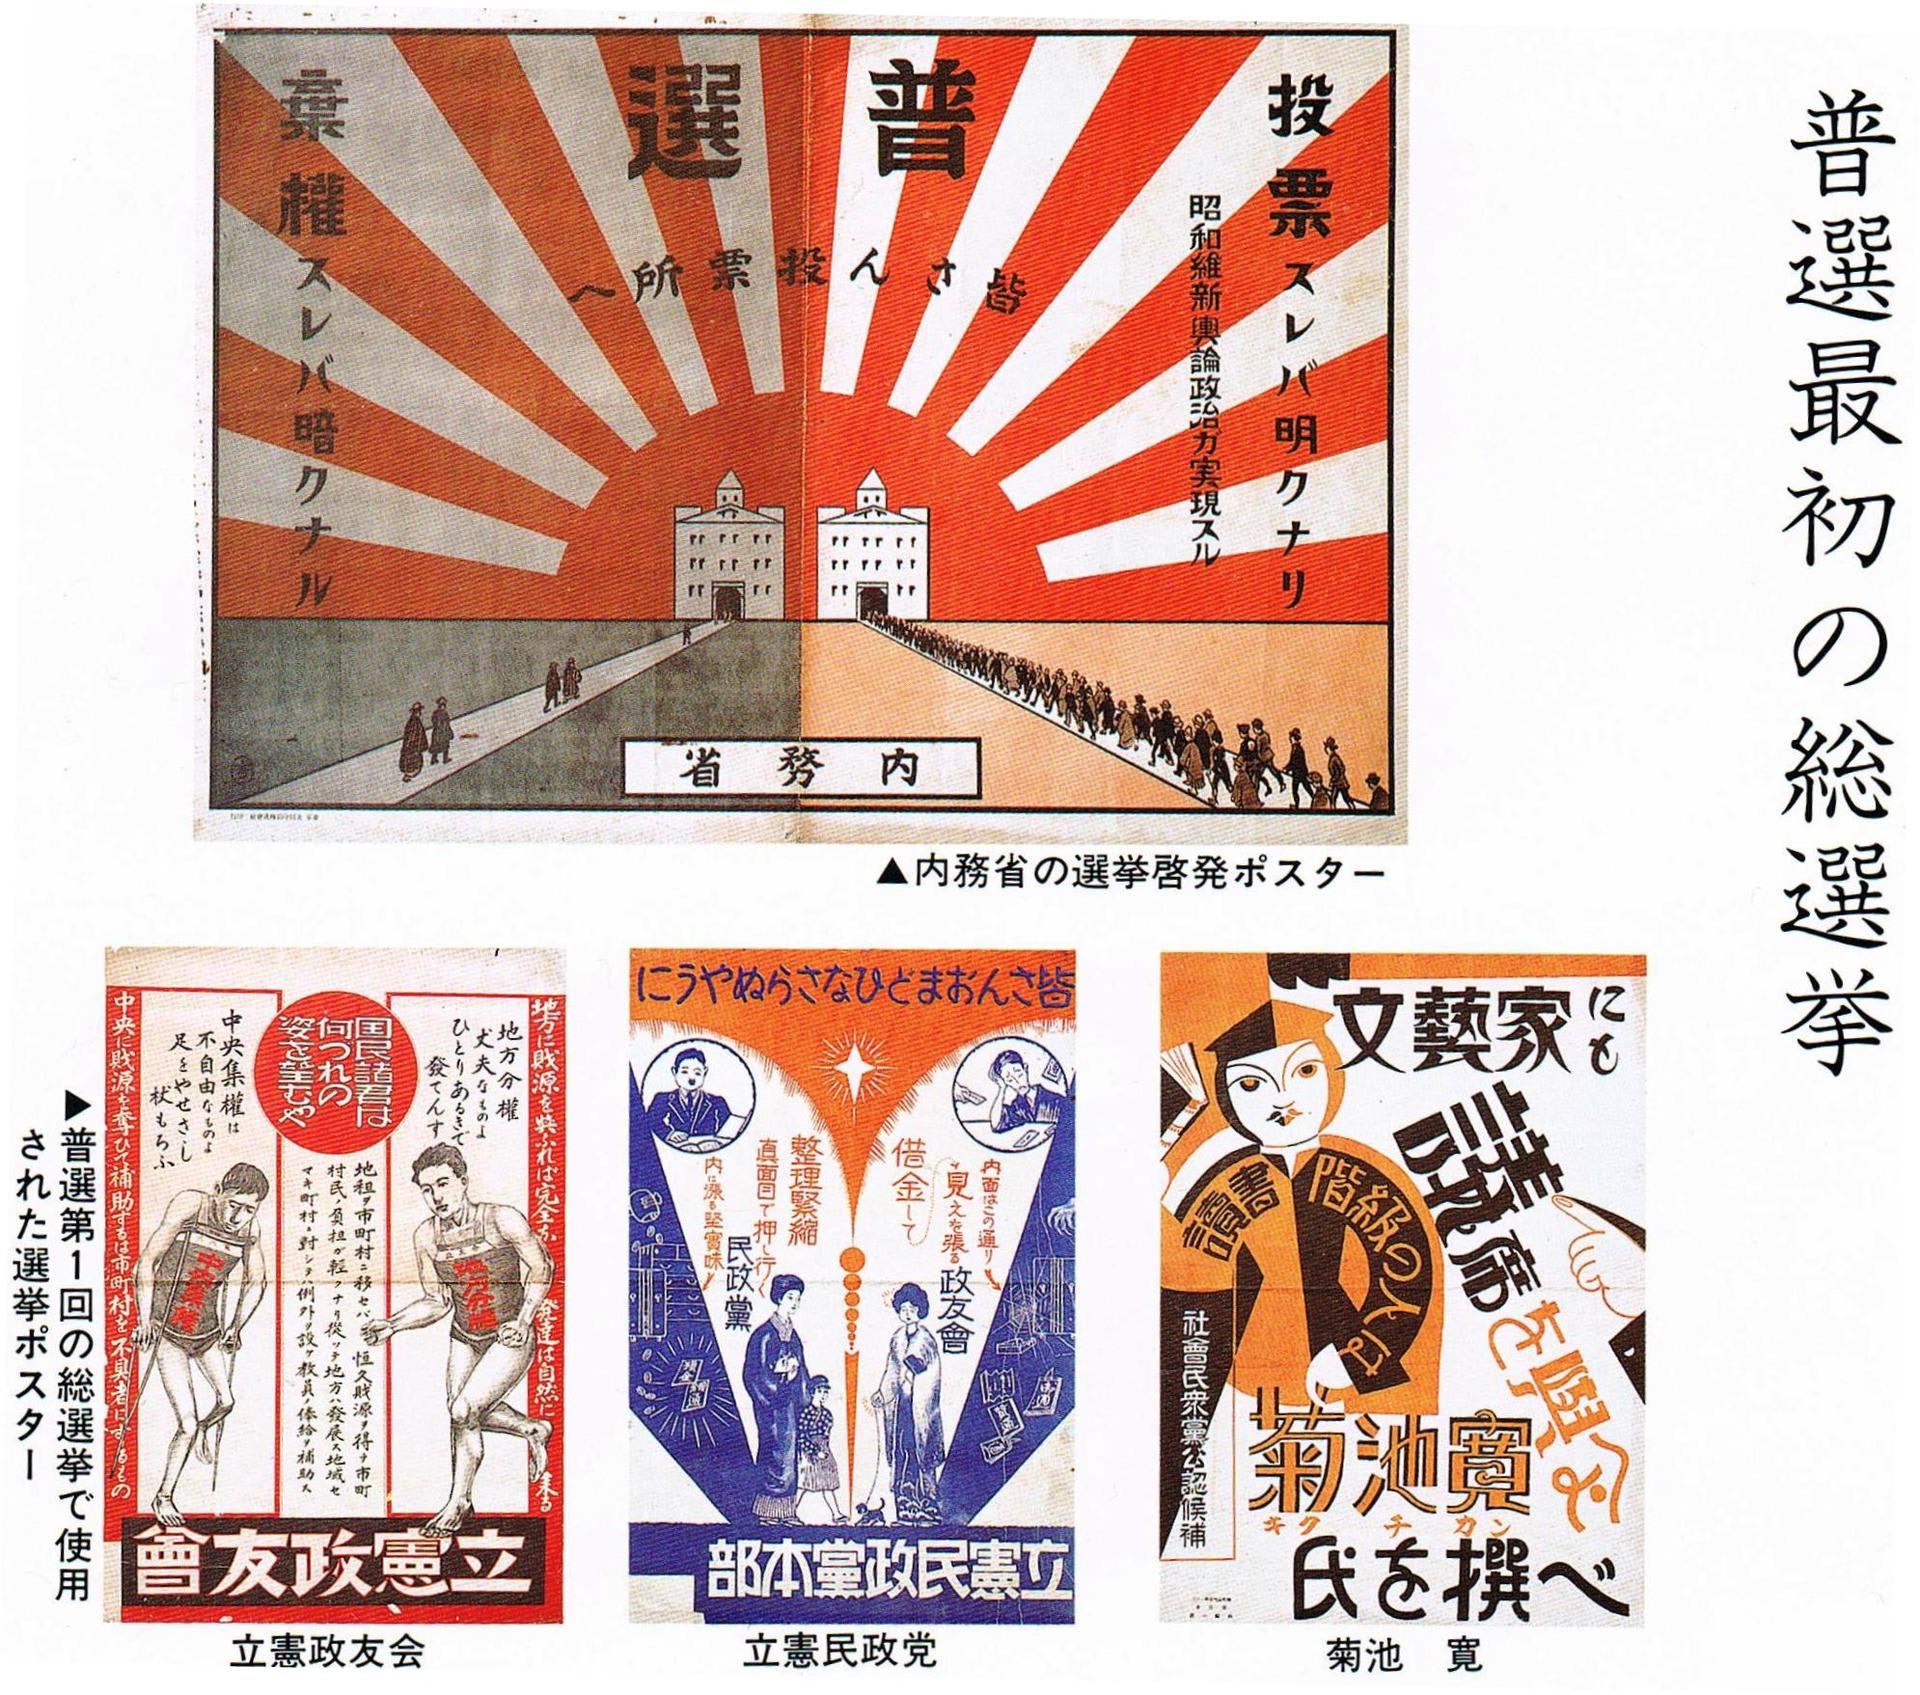 d7d6988153 細川門下2人が対決 20年前と変わらぬ「鄙の論理」 野田・松野